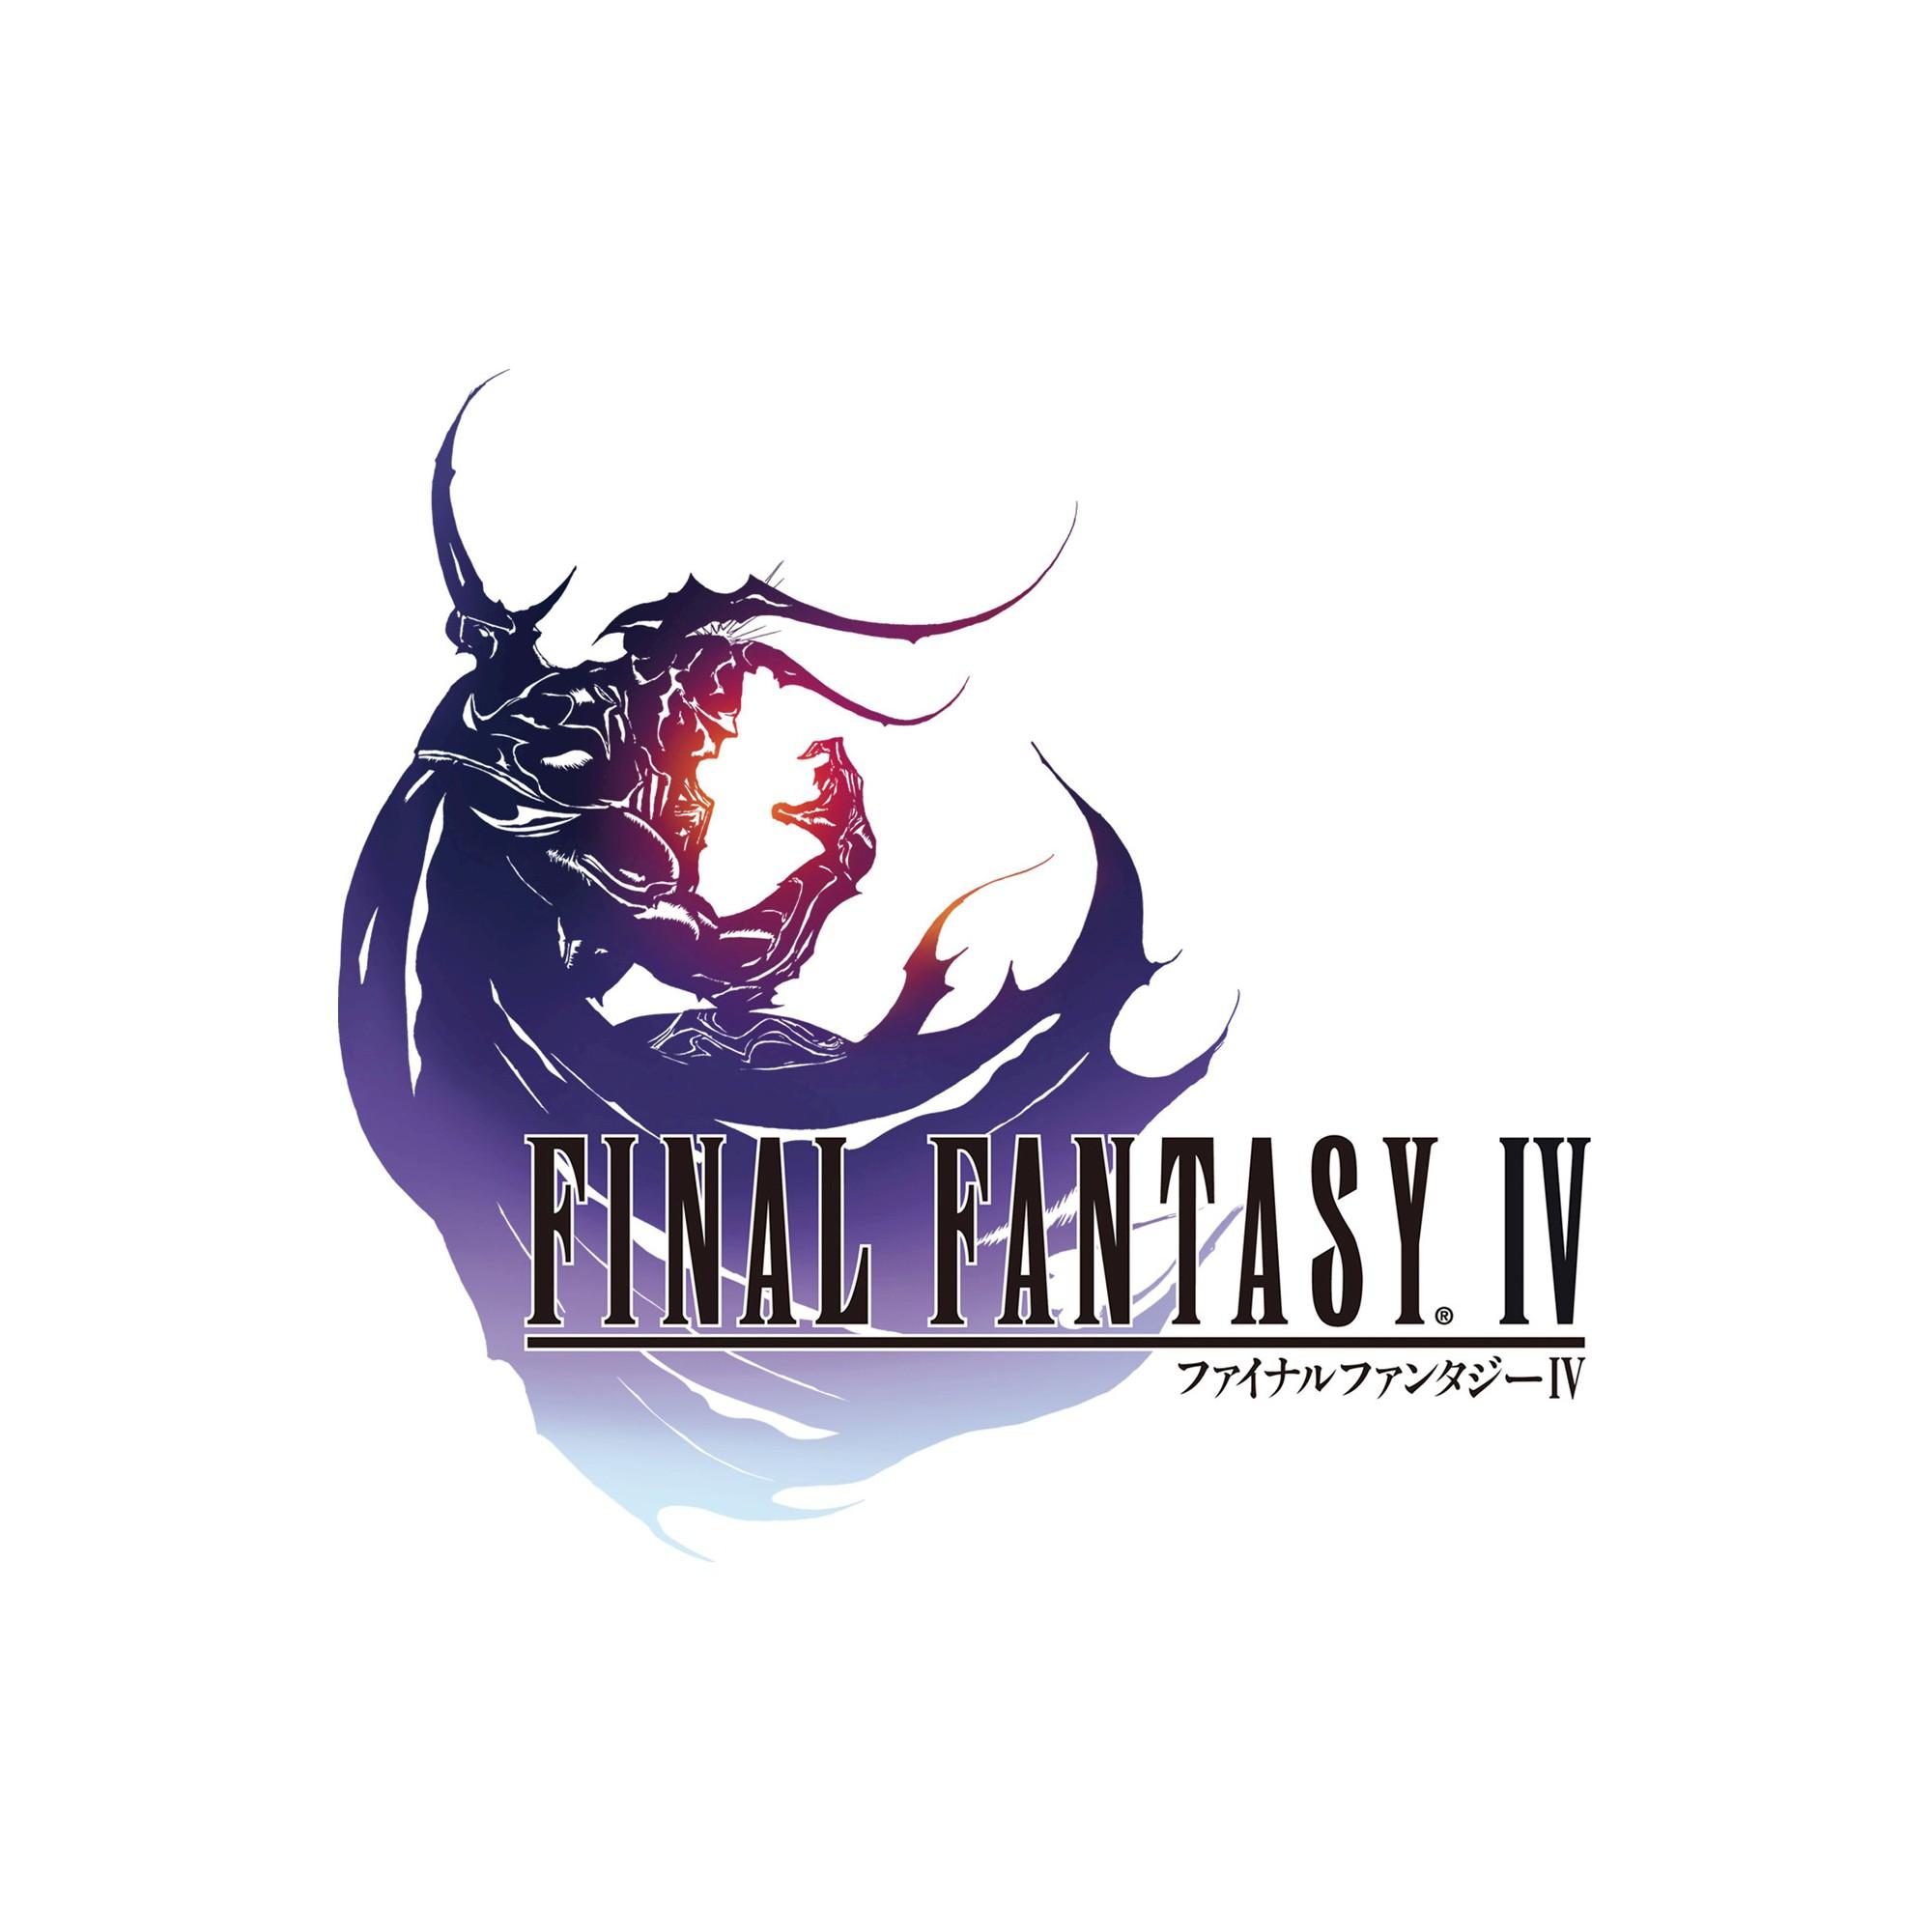 Final Fantasy Iv Electronic Software Download Pc Games Final Fantasy Vi Final Fantasy Final Fantasy Iv